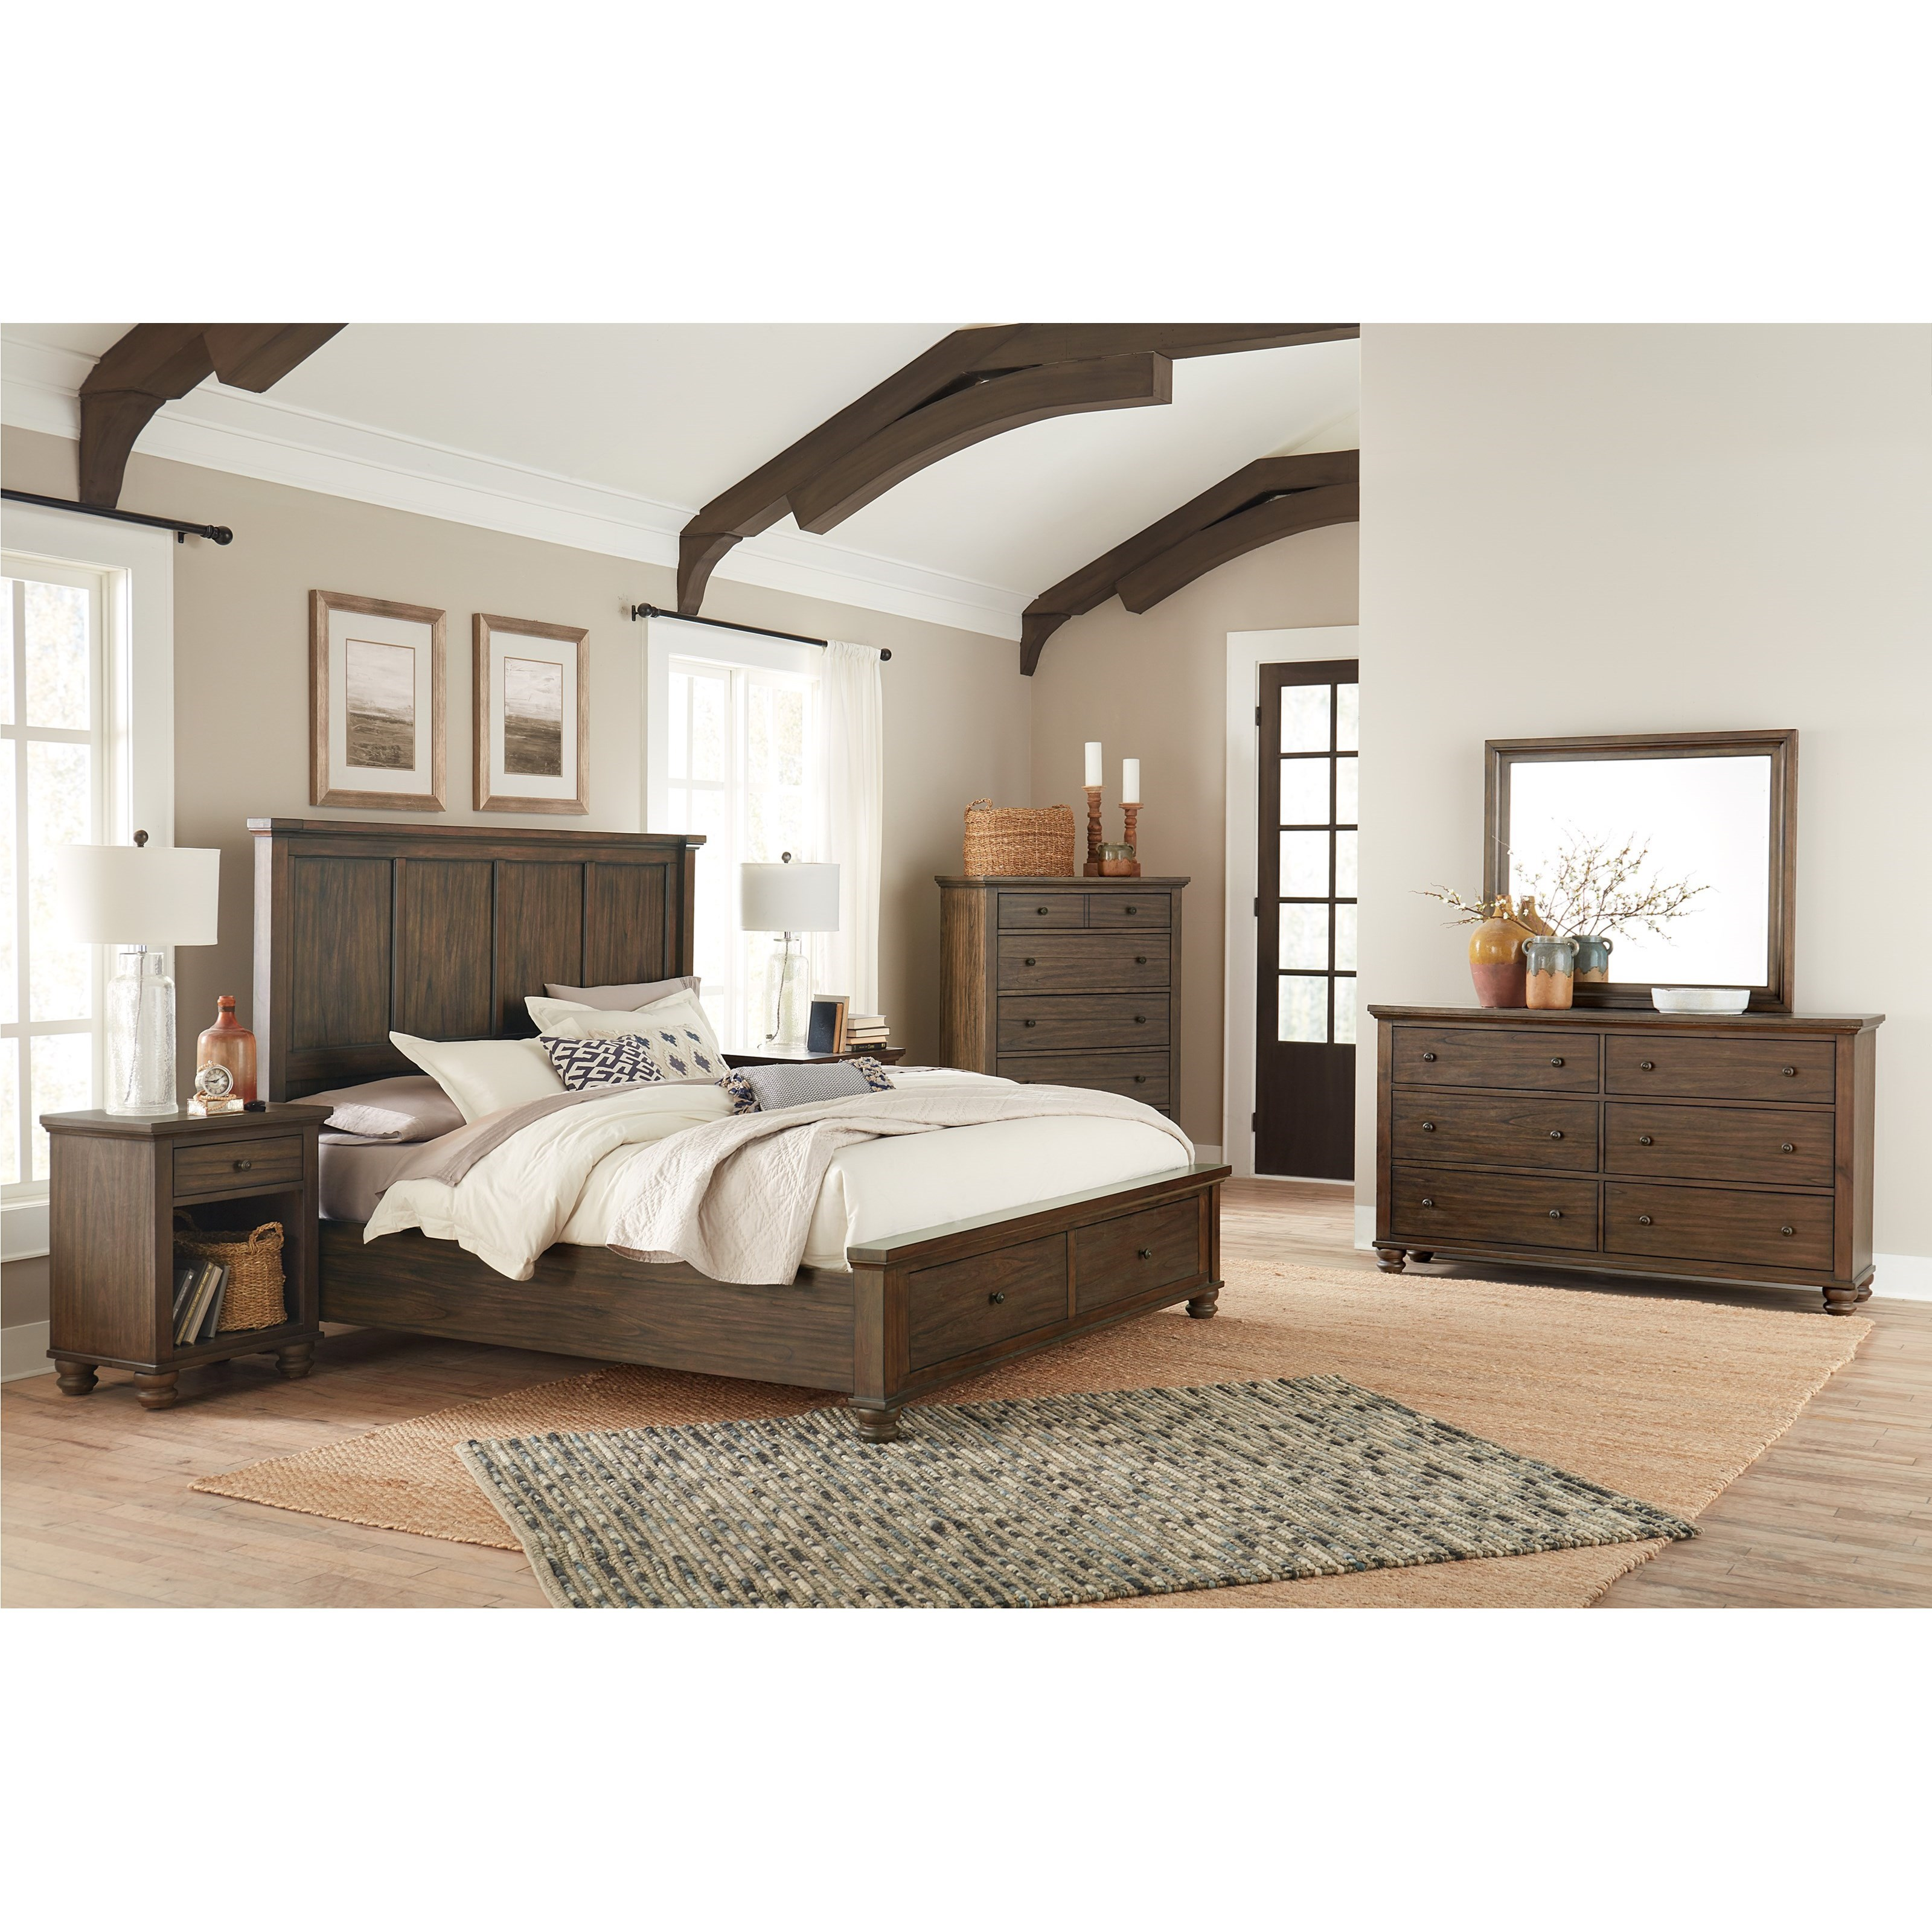 Hudson Valley King Bedroom Group by Aspenhome at Walker's Furniture